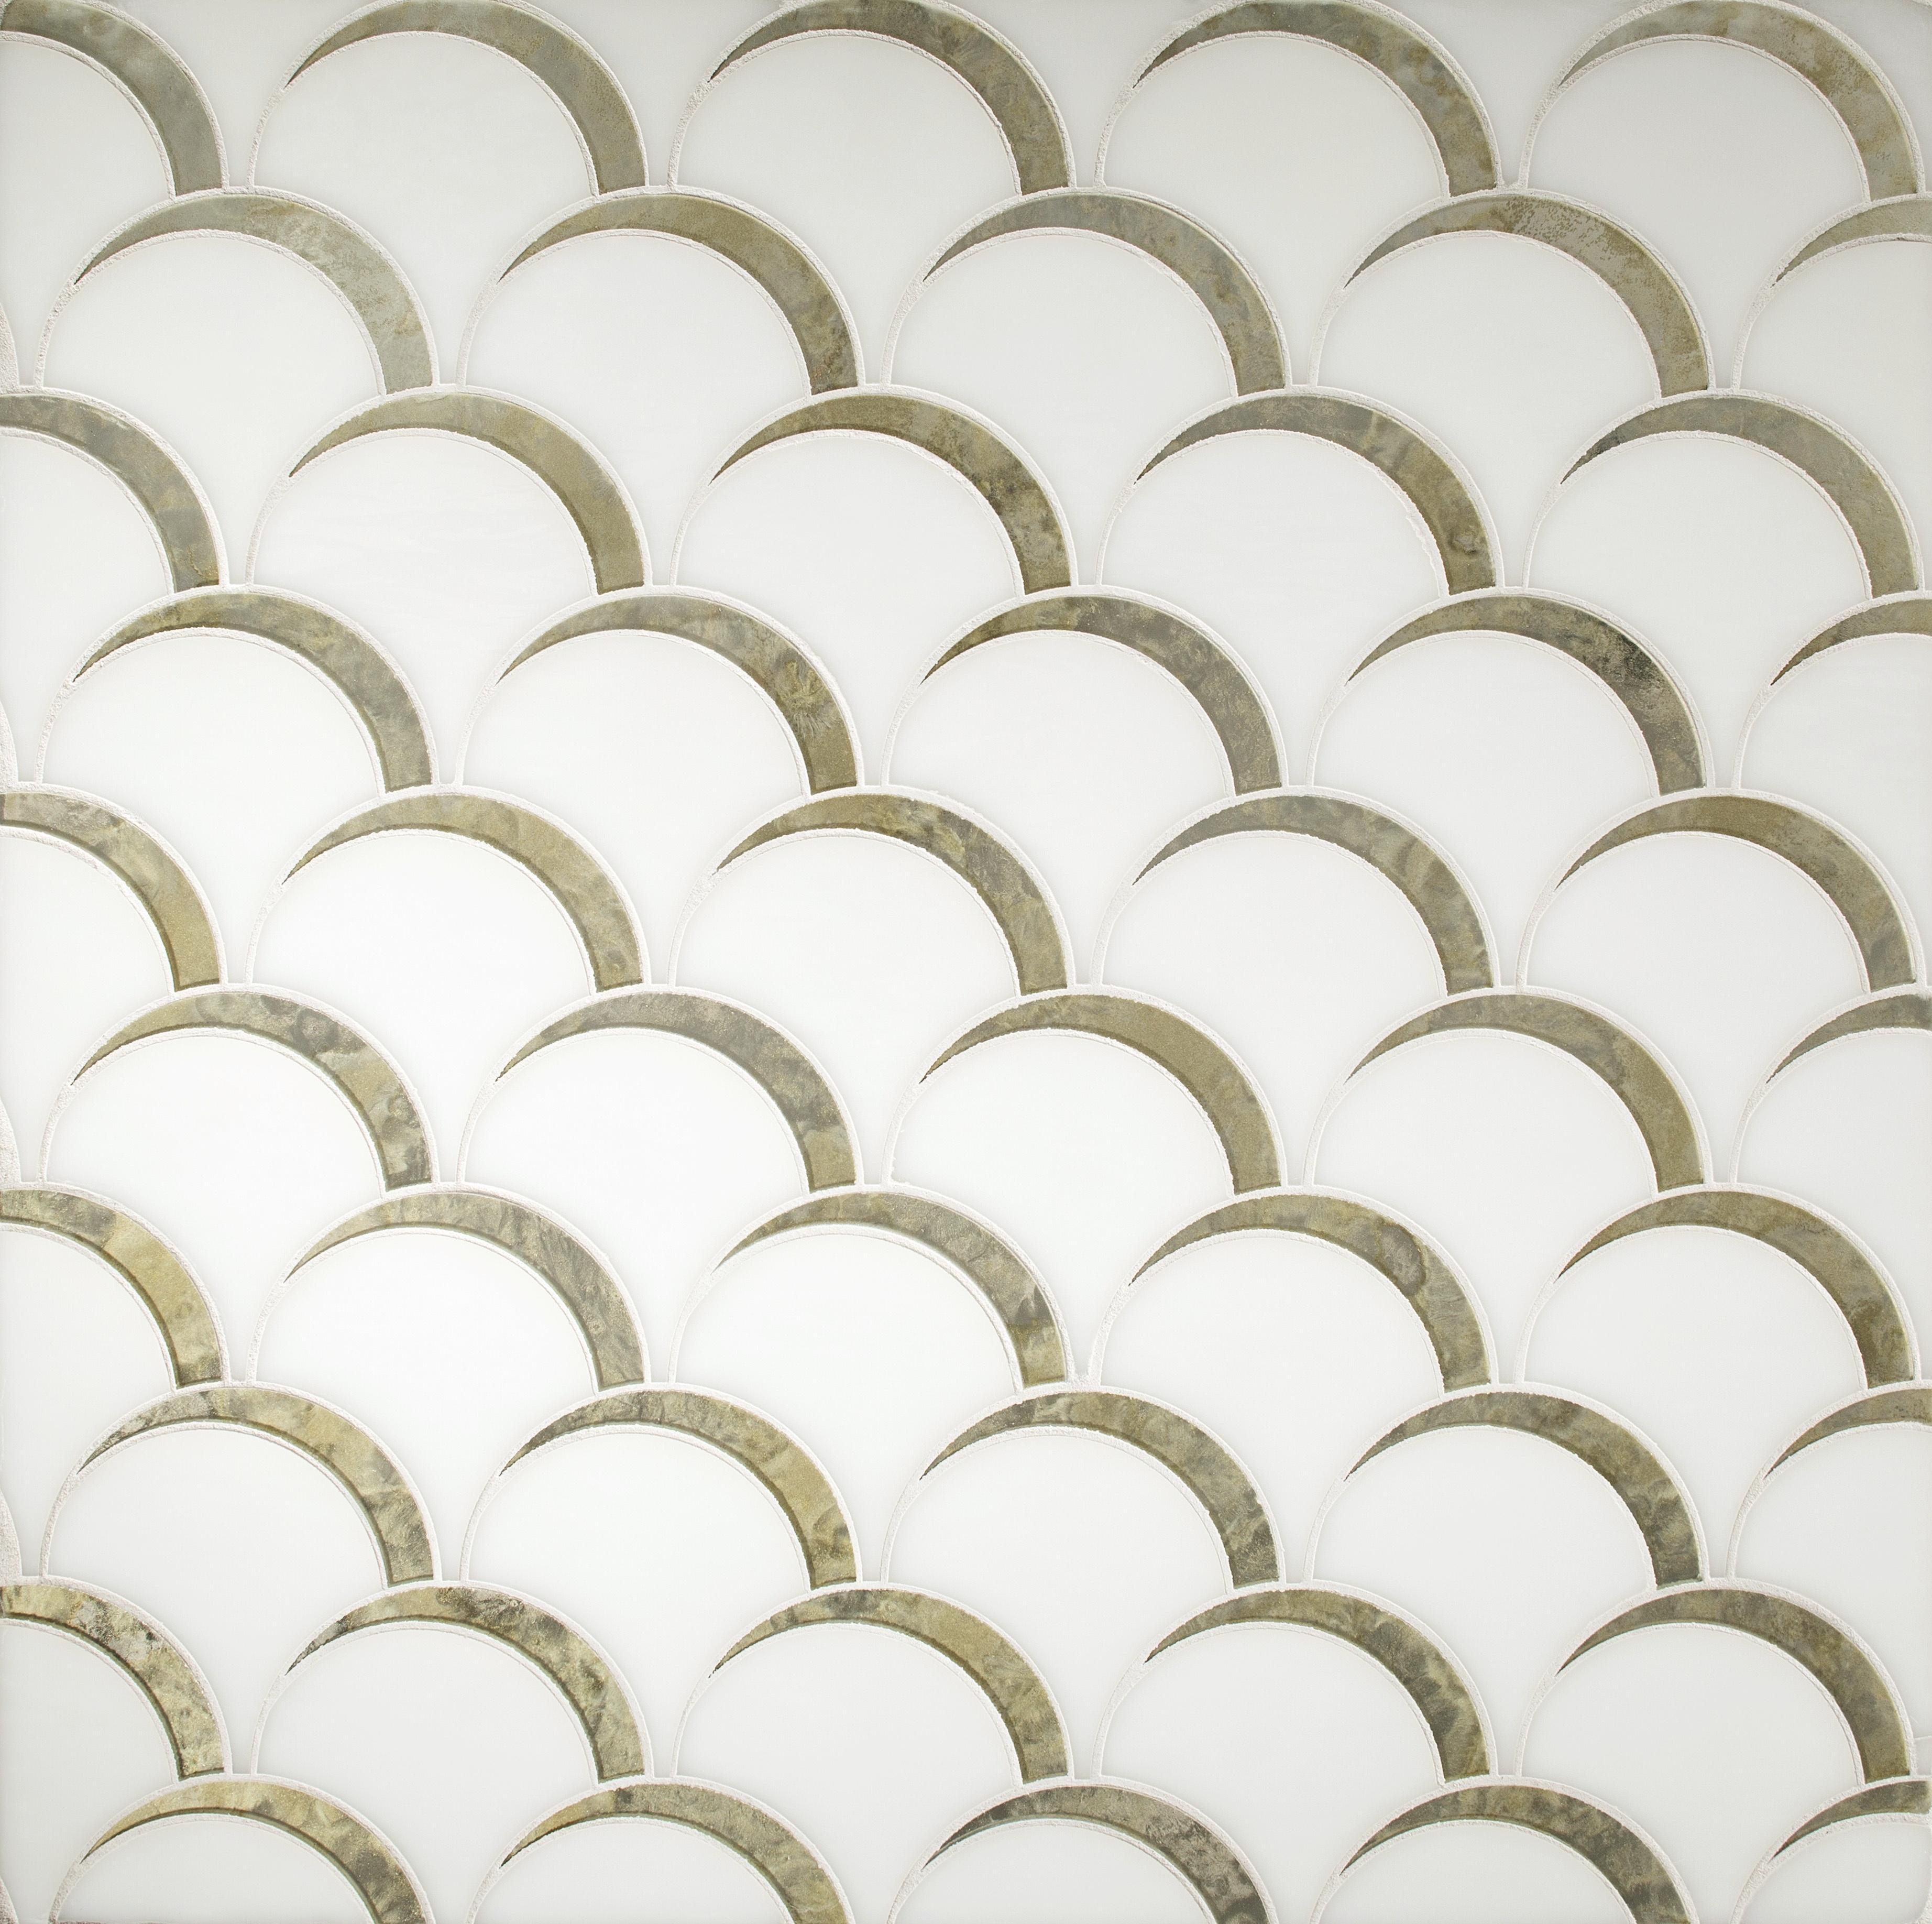 scallop-glass-tile-pattern